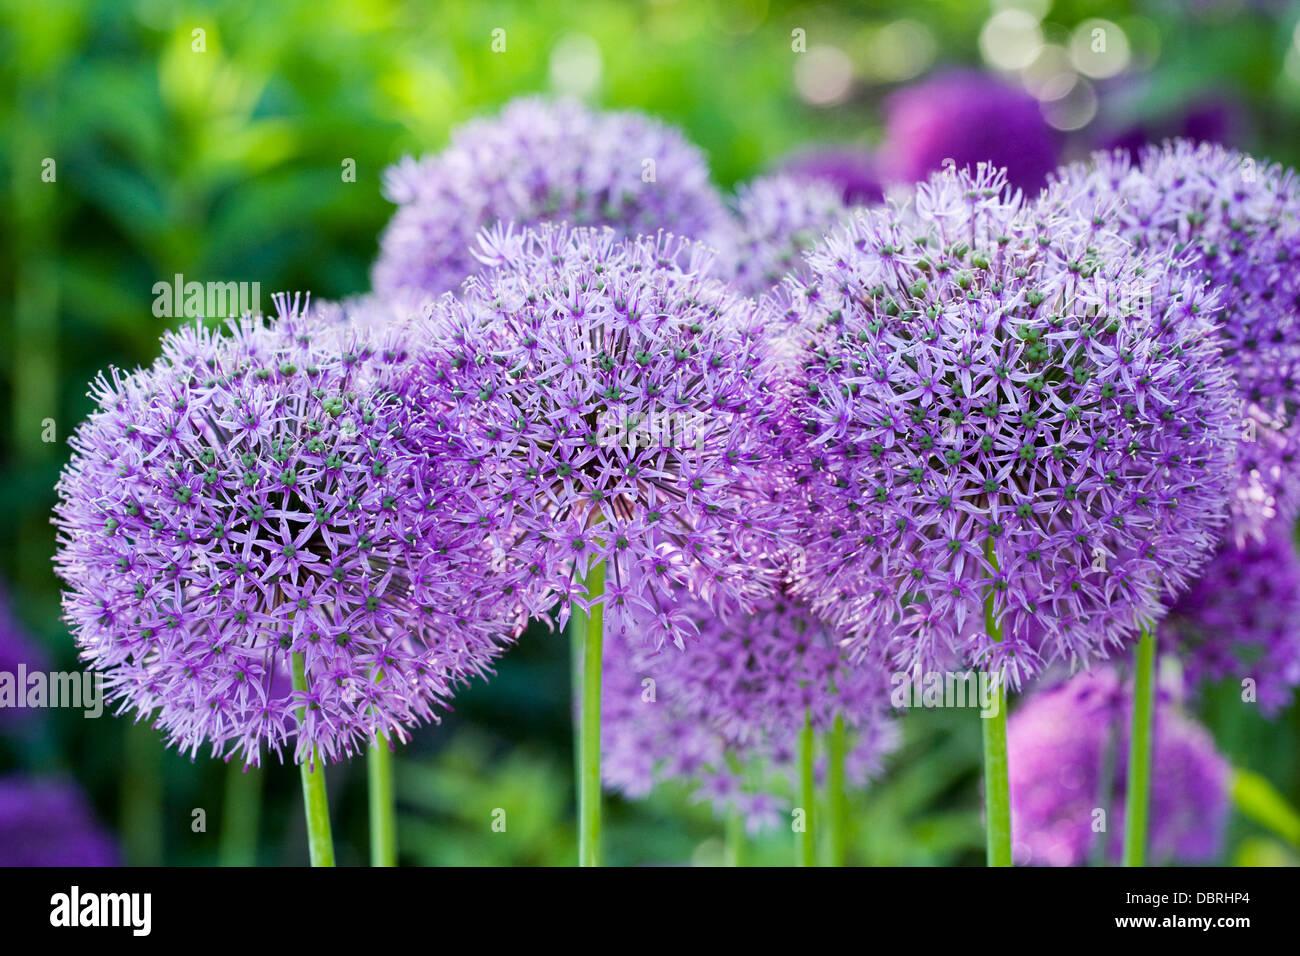 Alliums growing in an English garden. - Stock Image